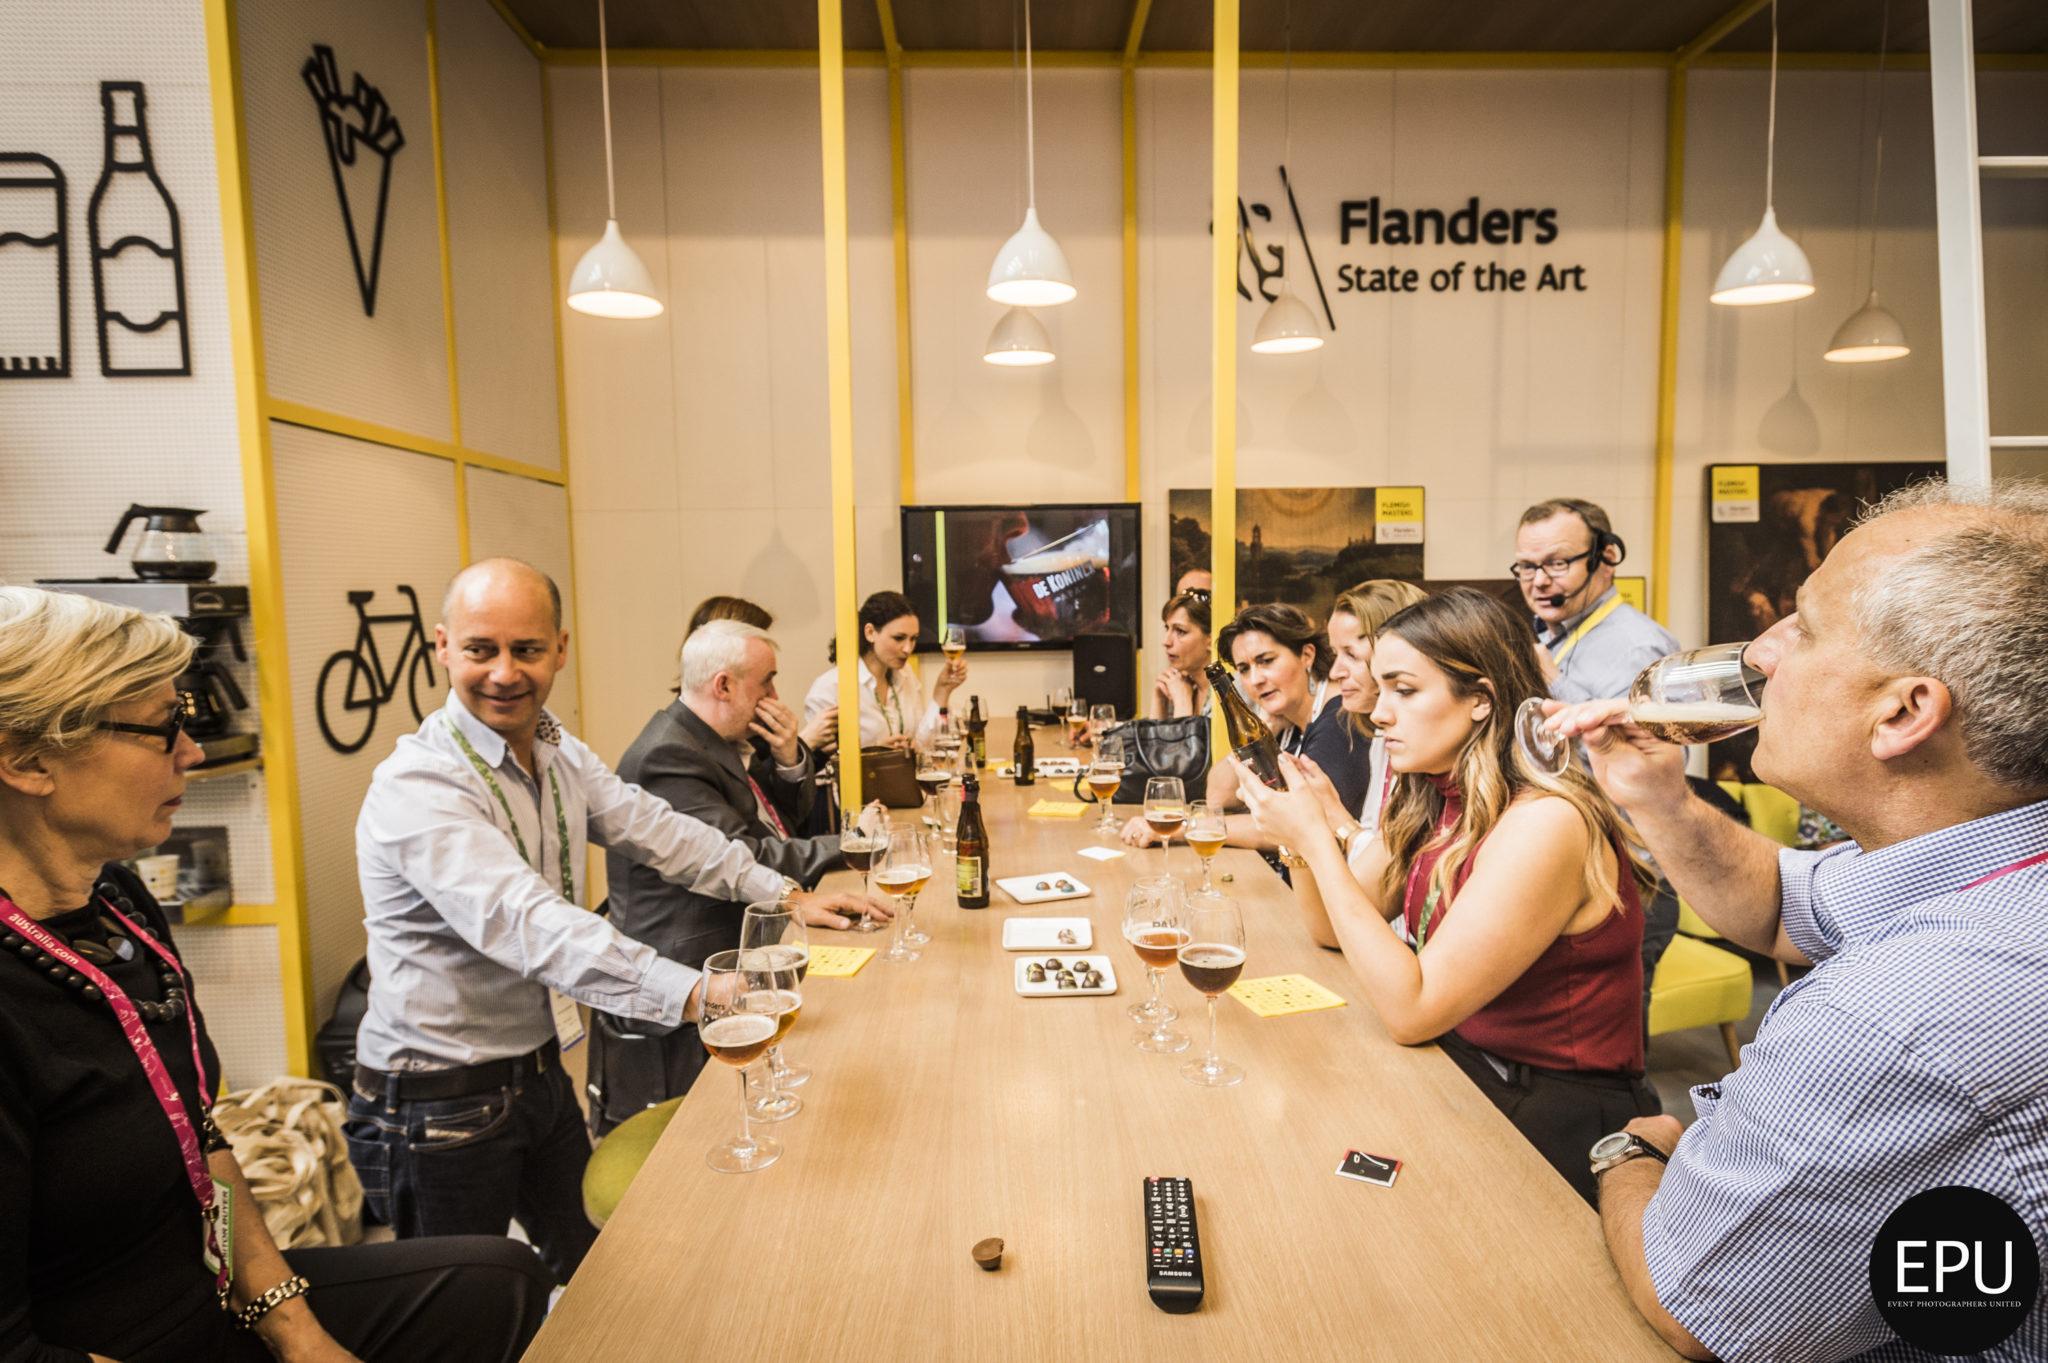 Visit-Flanders-IMEX-Frankfurt-Mei1724 Visit Flanders IMEX Frankfurt Mei17